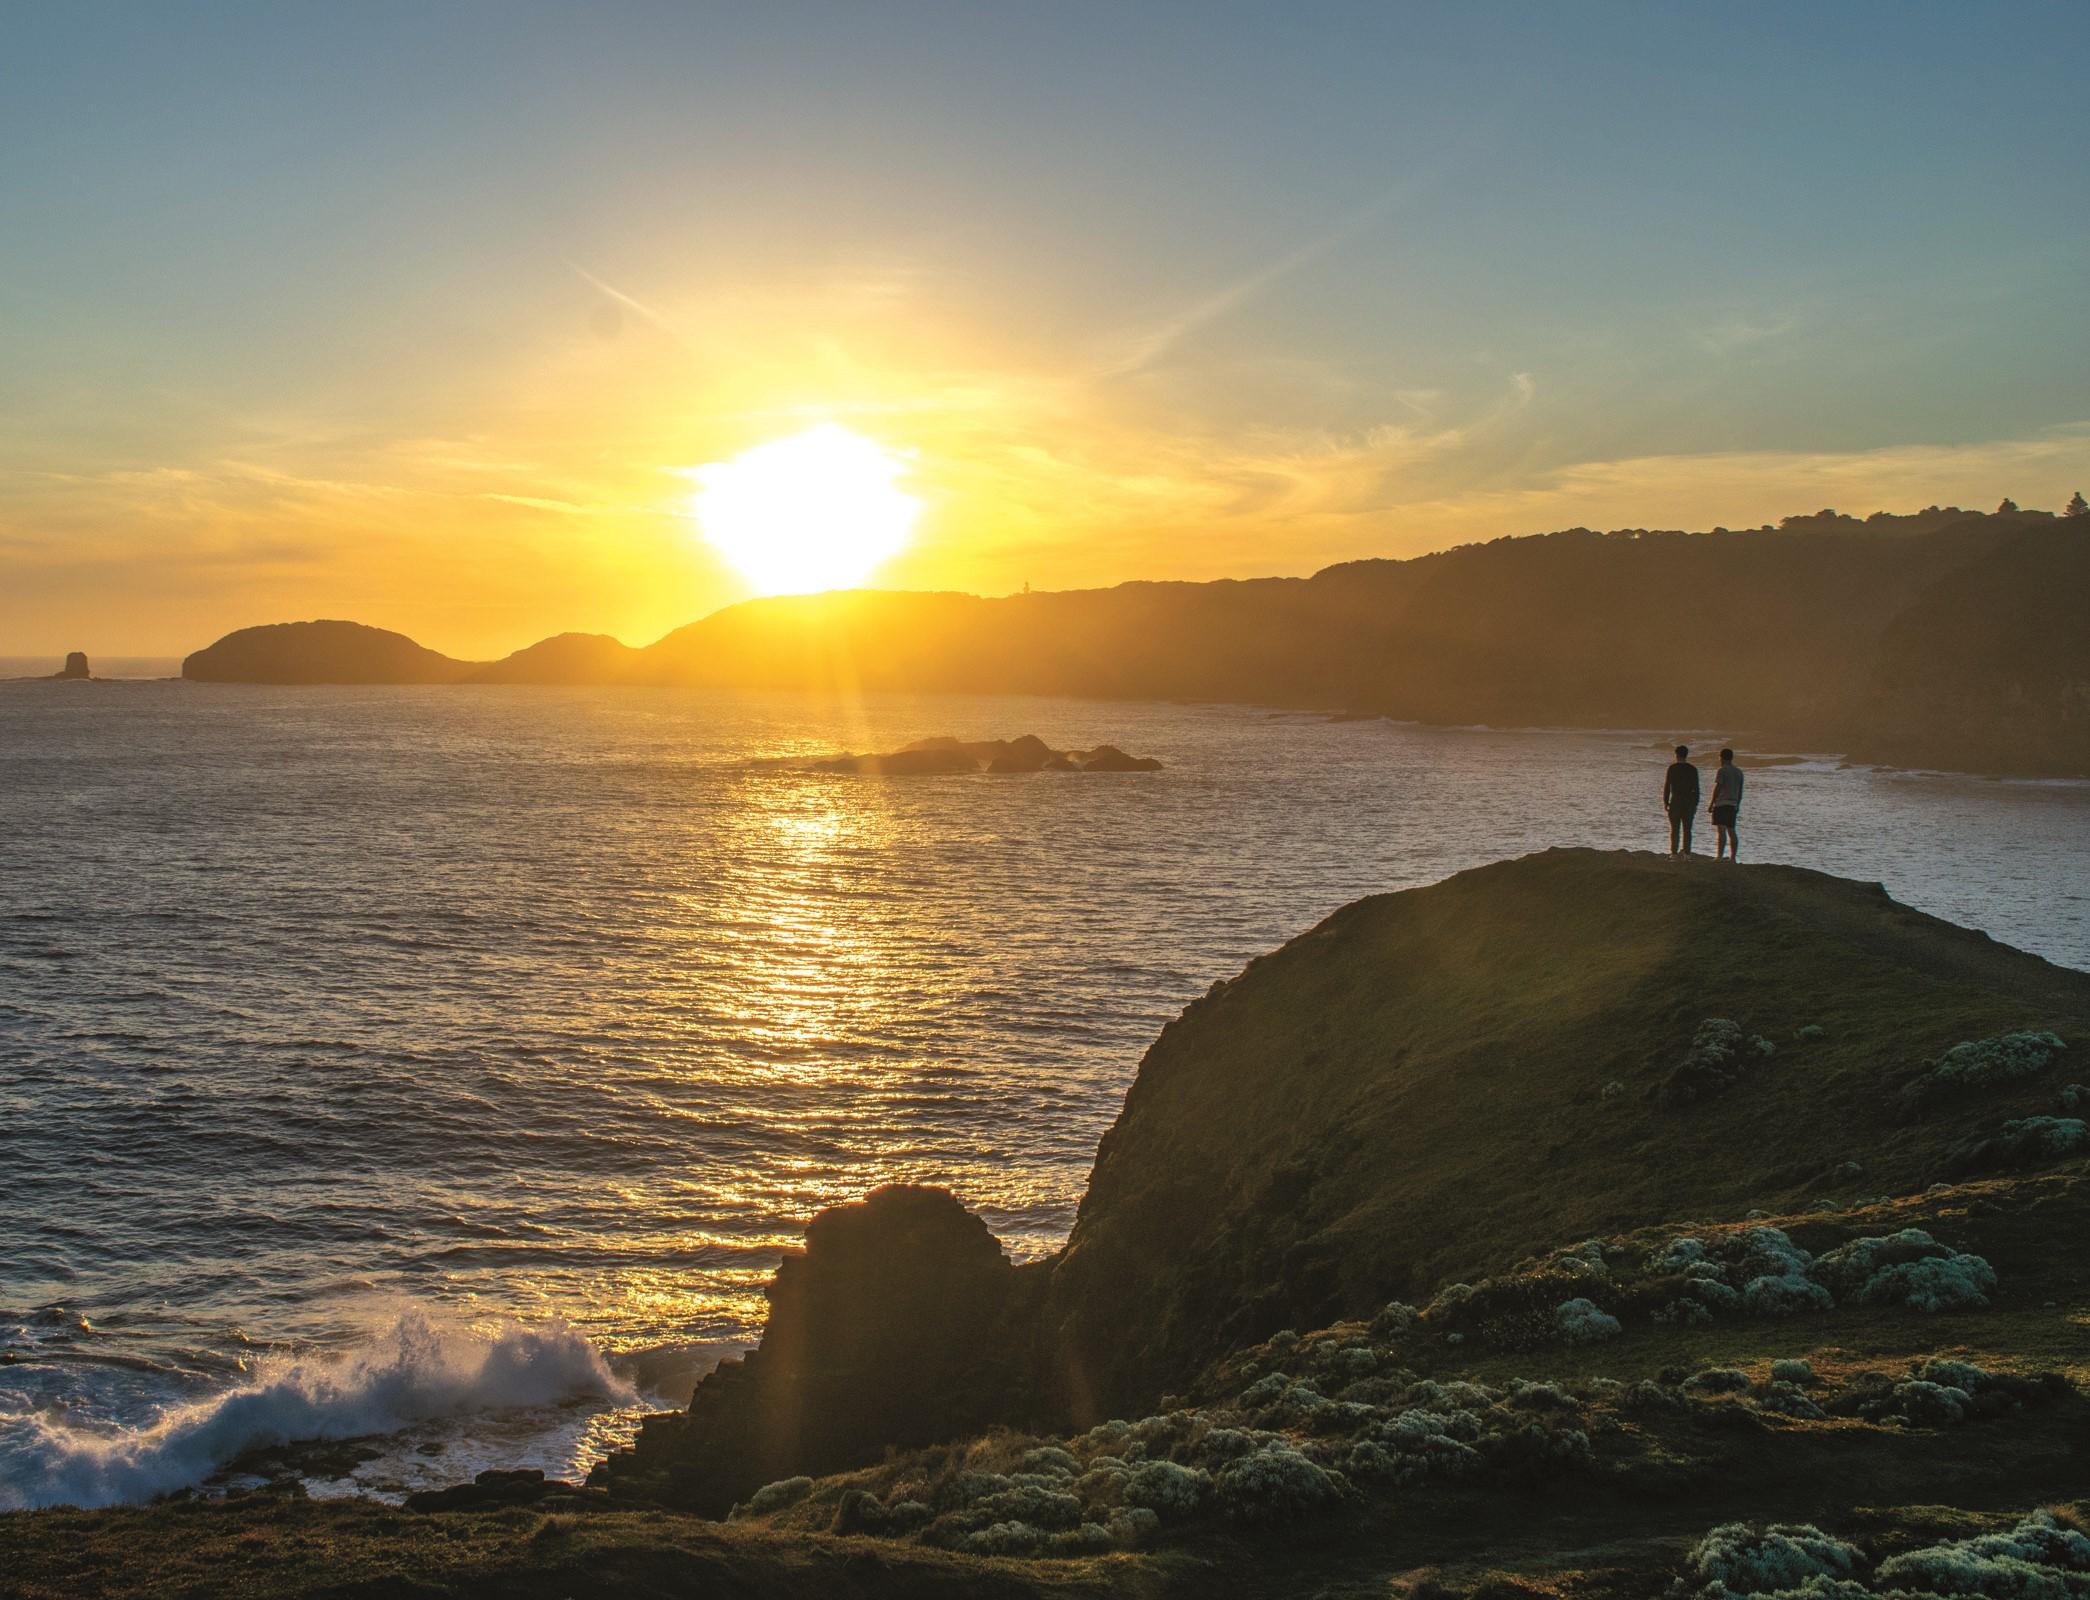 Victoria's Top 5 Adventure Regions